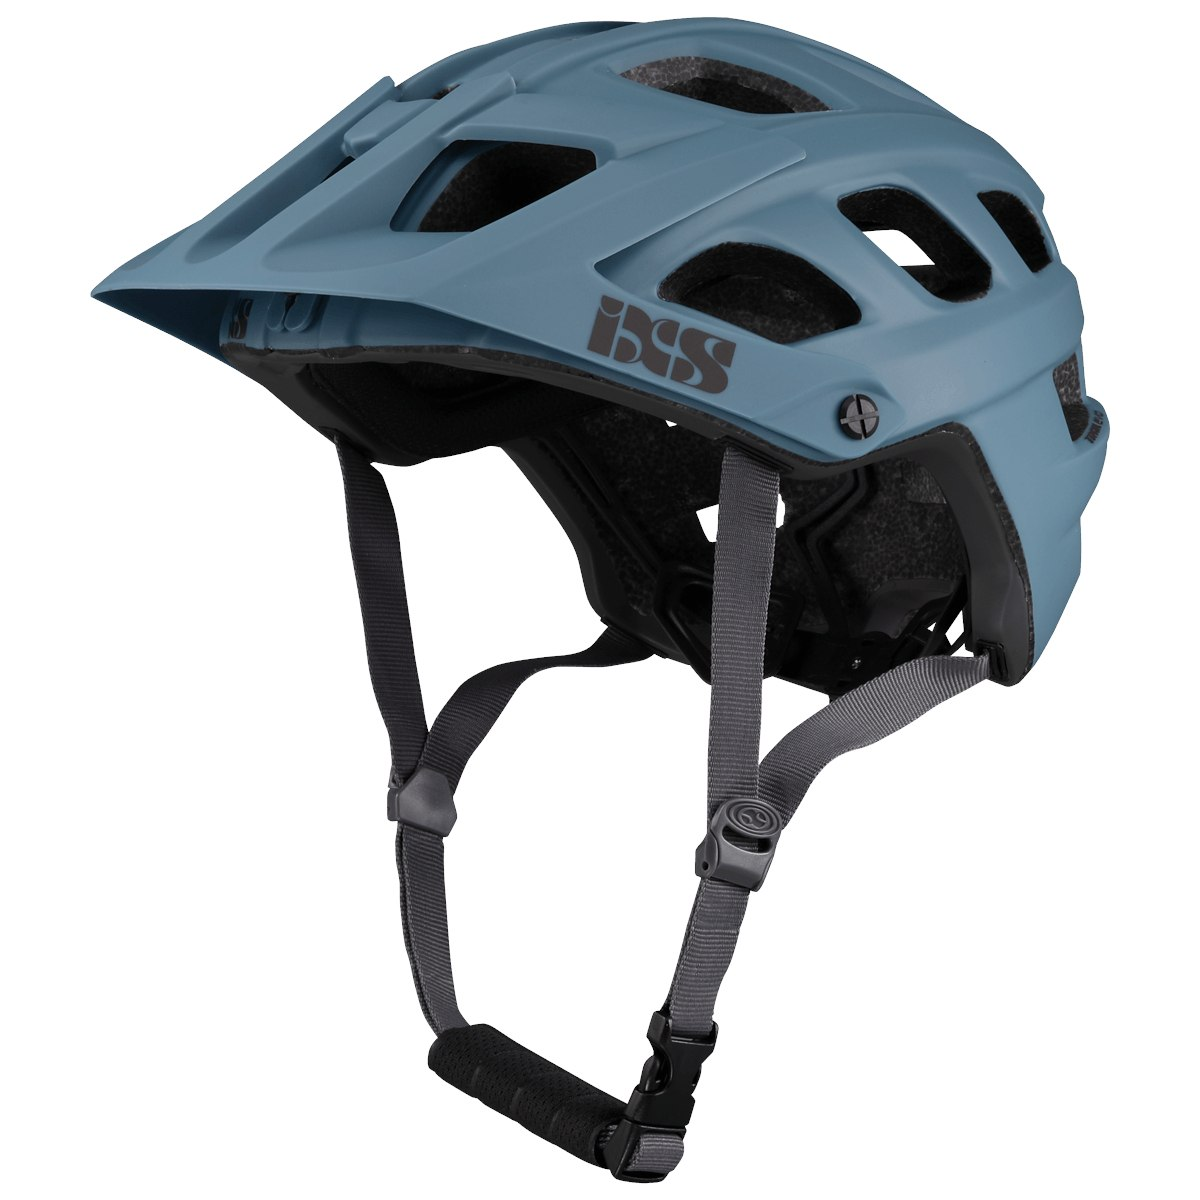 iXS Trail EVO Helmet - ocean